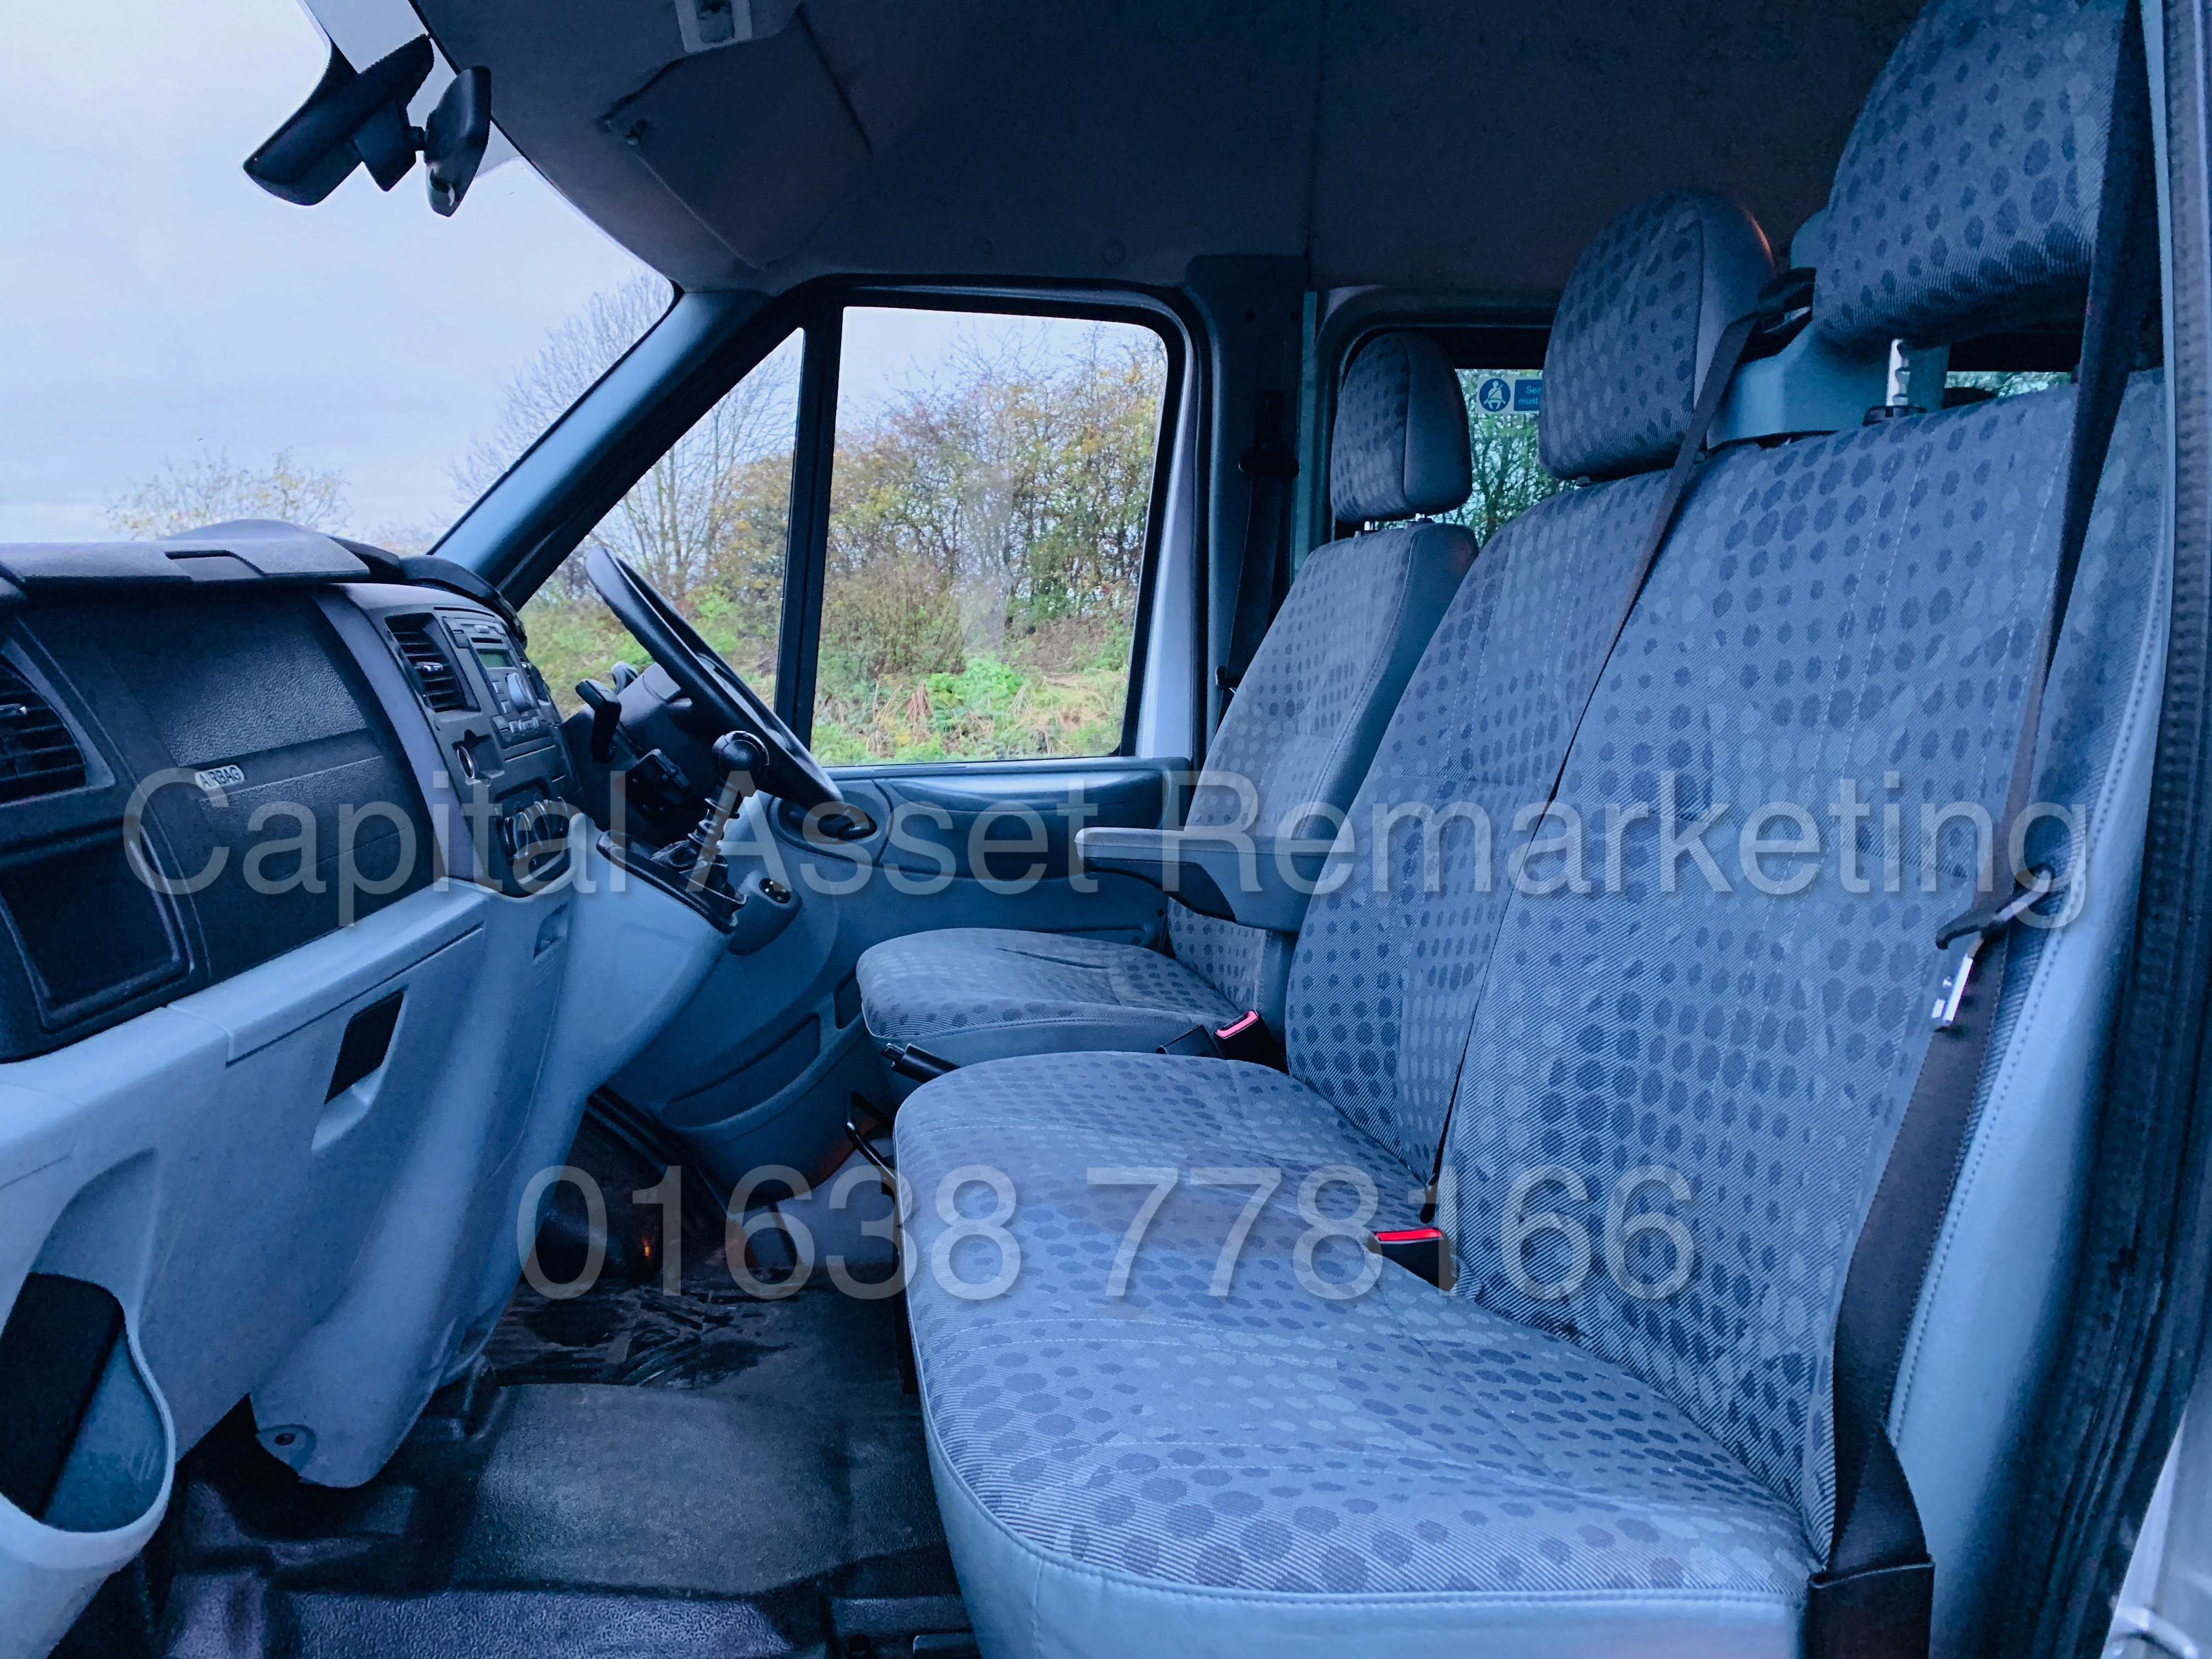 FORD TRANSIT 135 T430 RWD *XLWB -17 SEATER MINI-BUS* (2013) '2.2 TDCI - 135 BHP - 6 SPEED' (1 OWNER) - Image 21 of 43